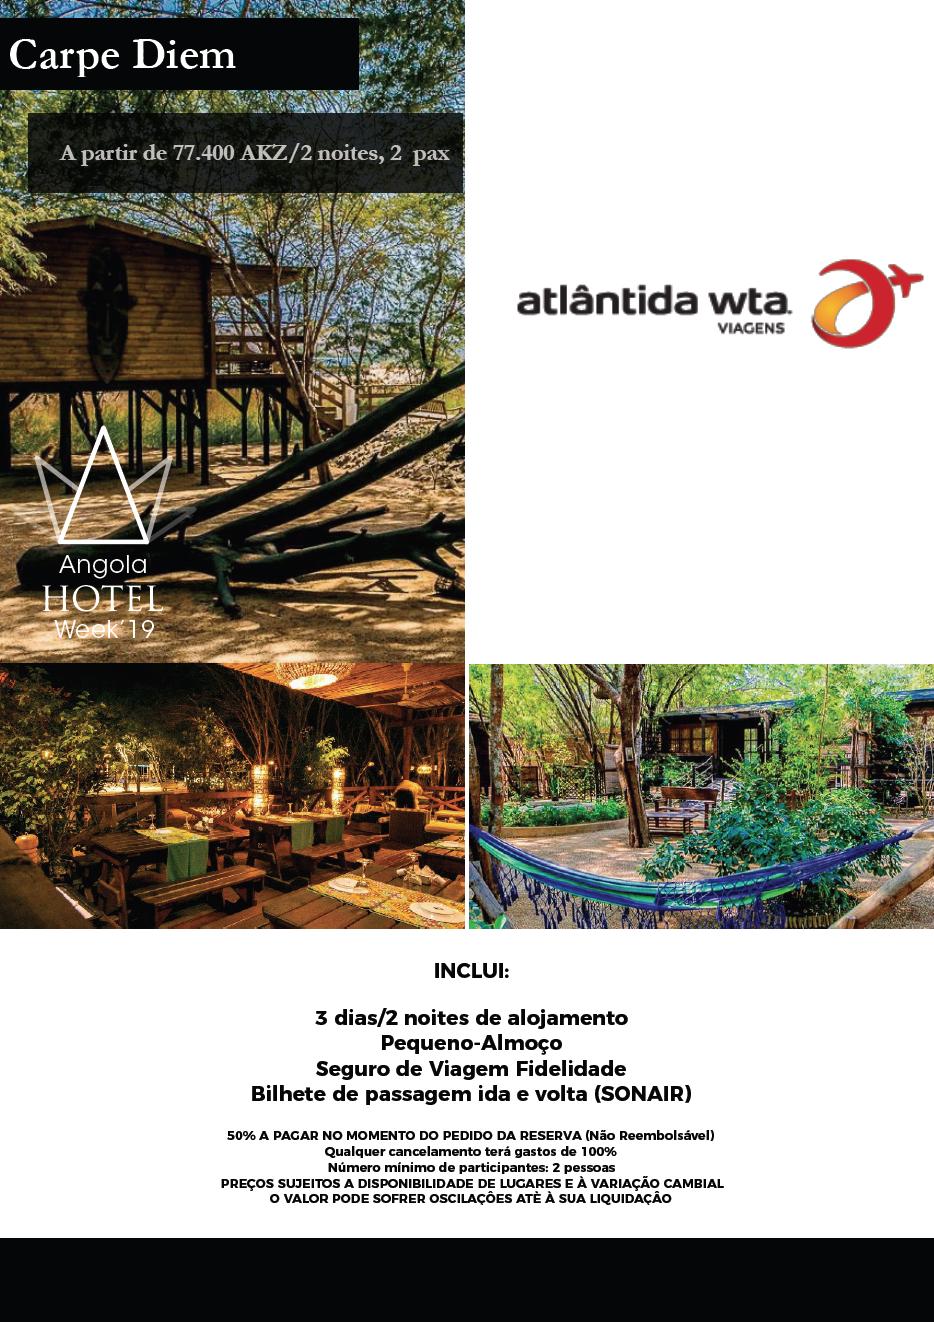 Atlantida_Lubango_Carpe.png